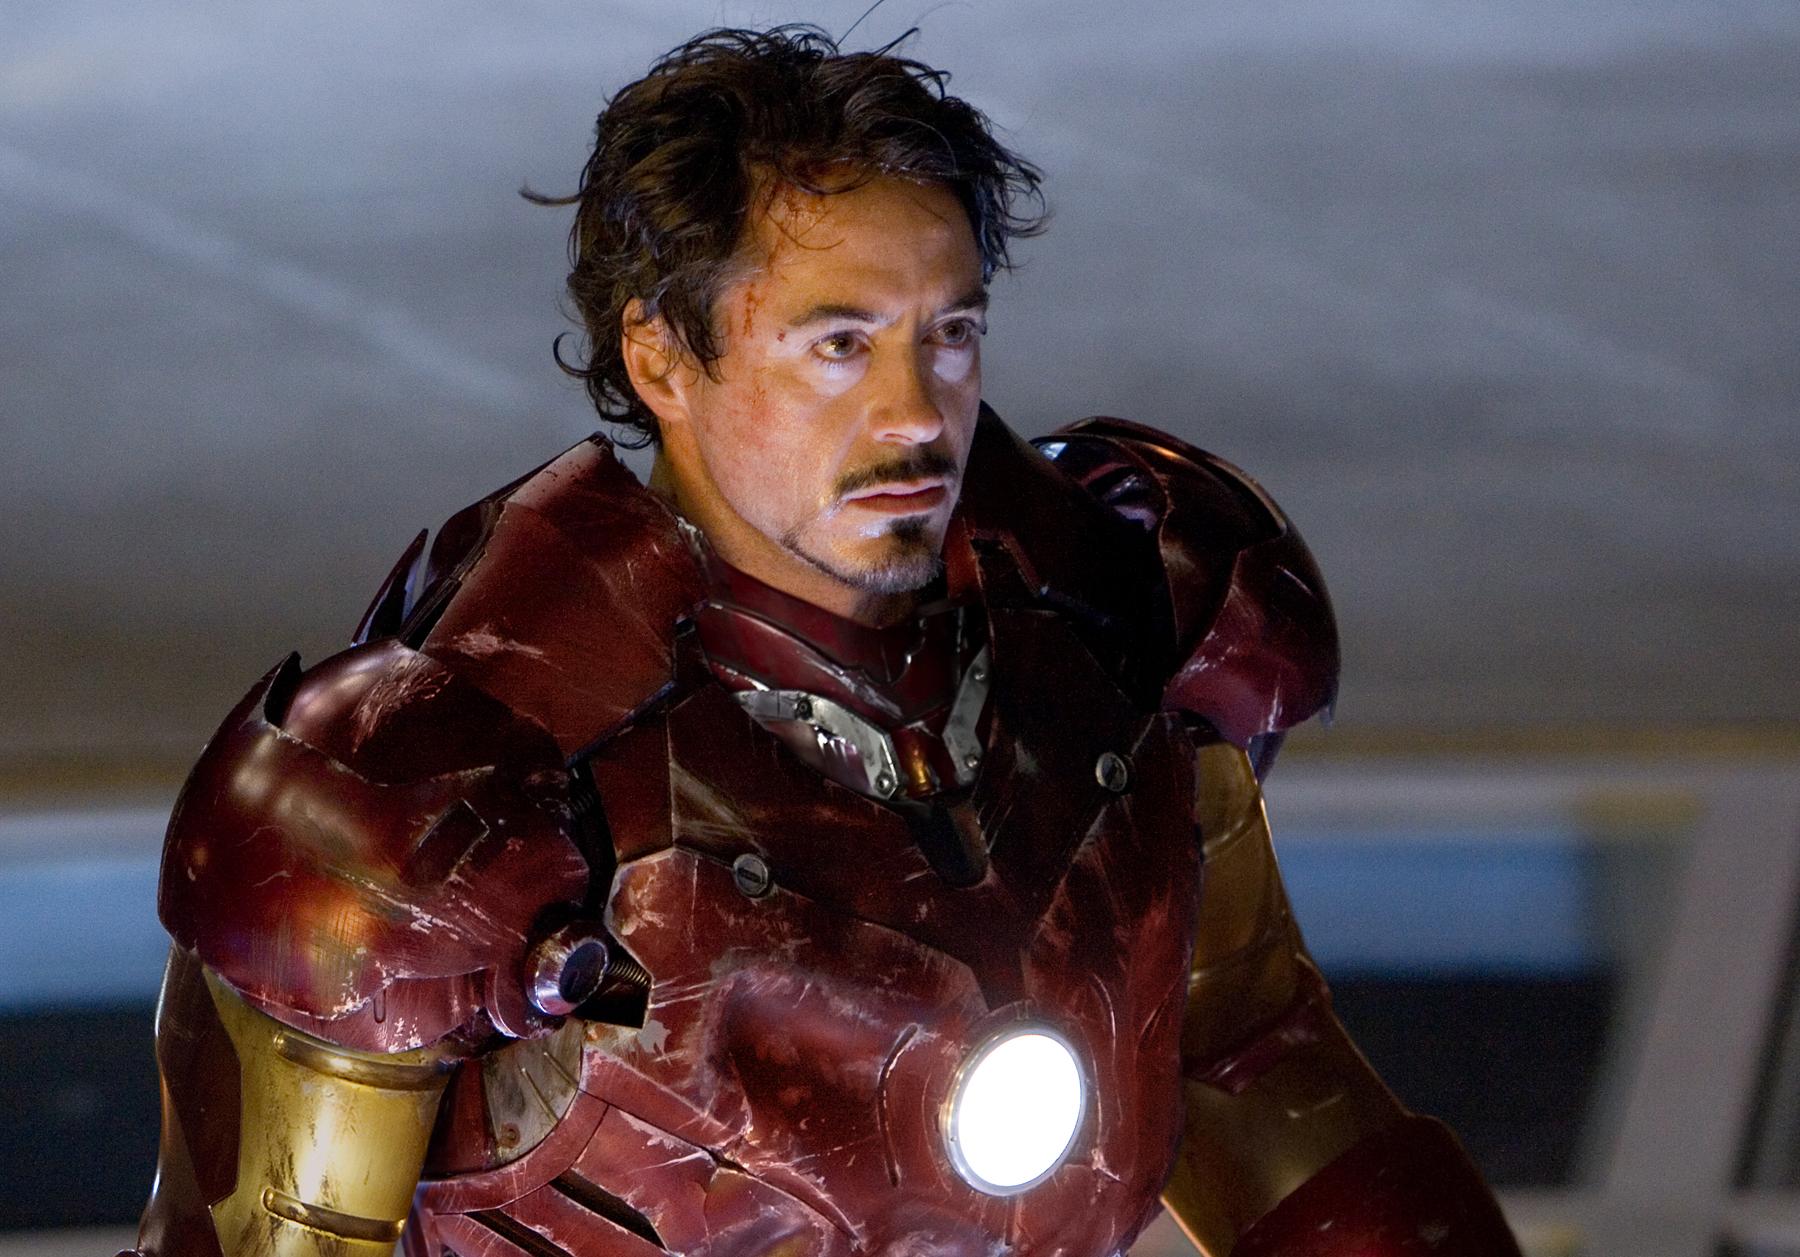 RDJ as Iron Man